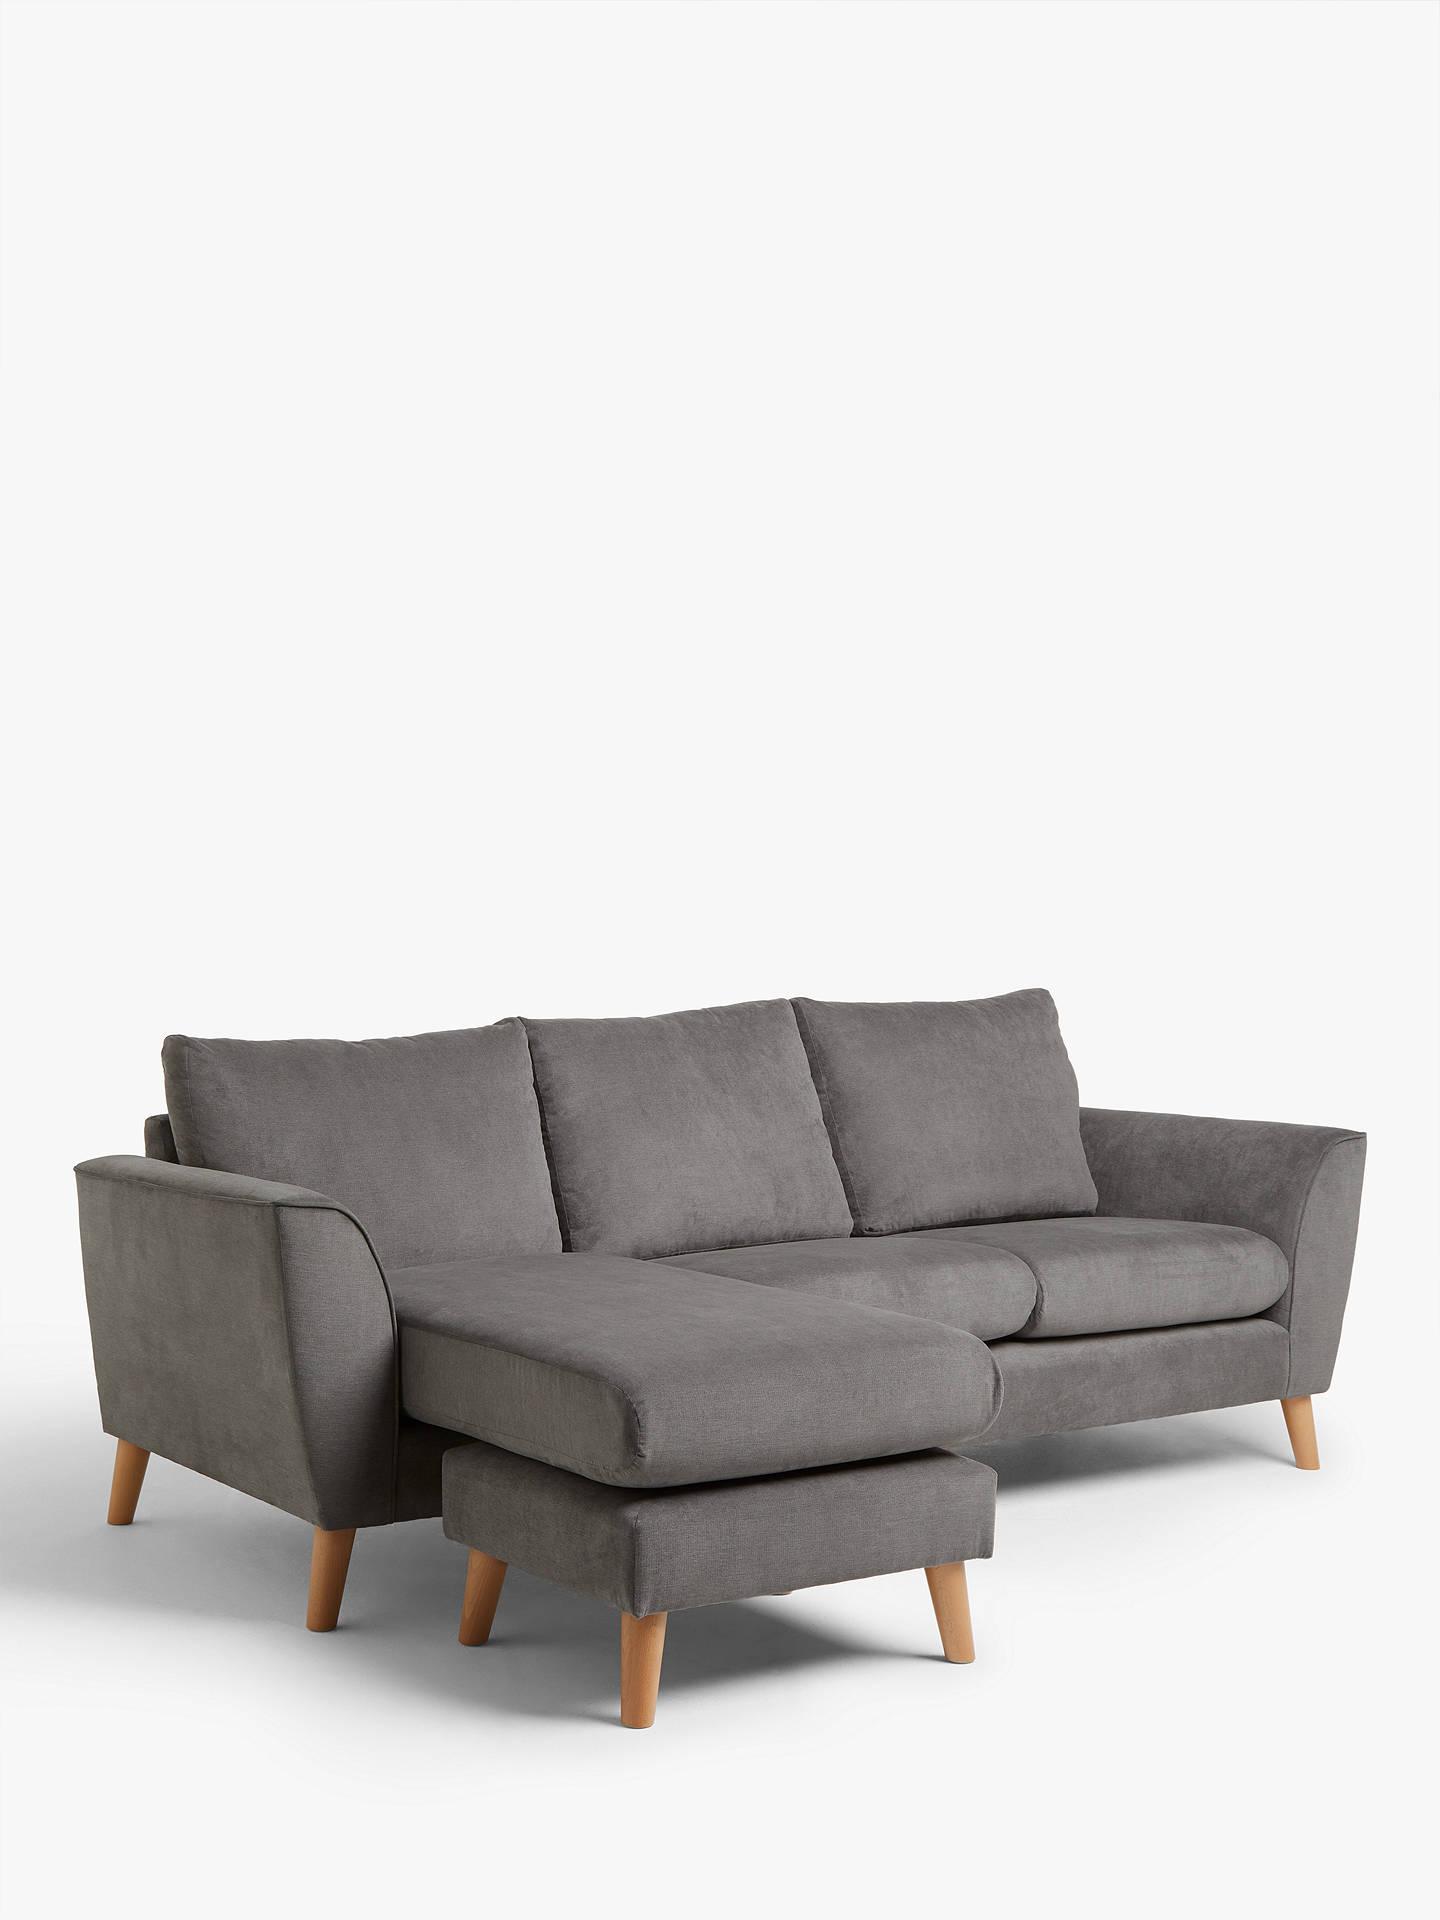 John Lewis & Partners Flare Chaise End Sofa, Light Leg